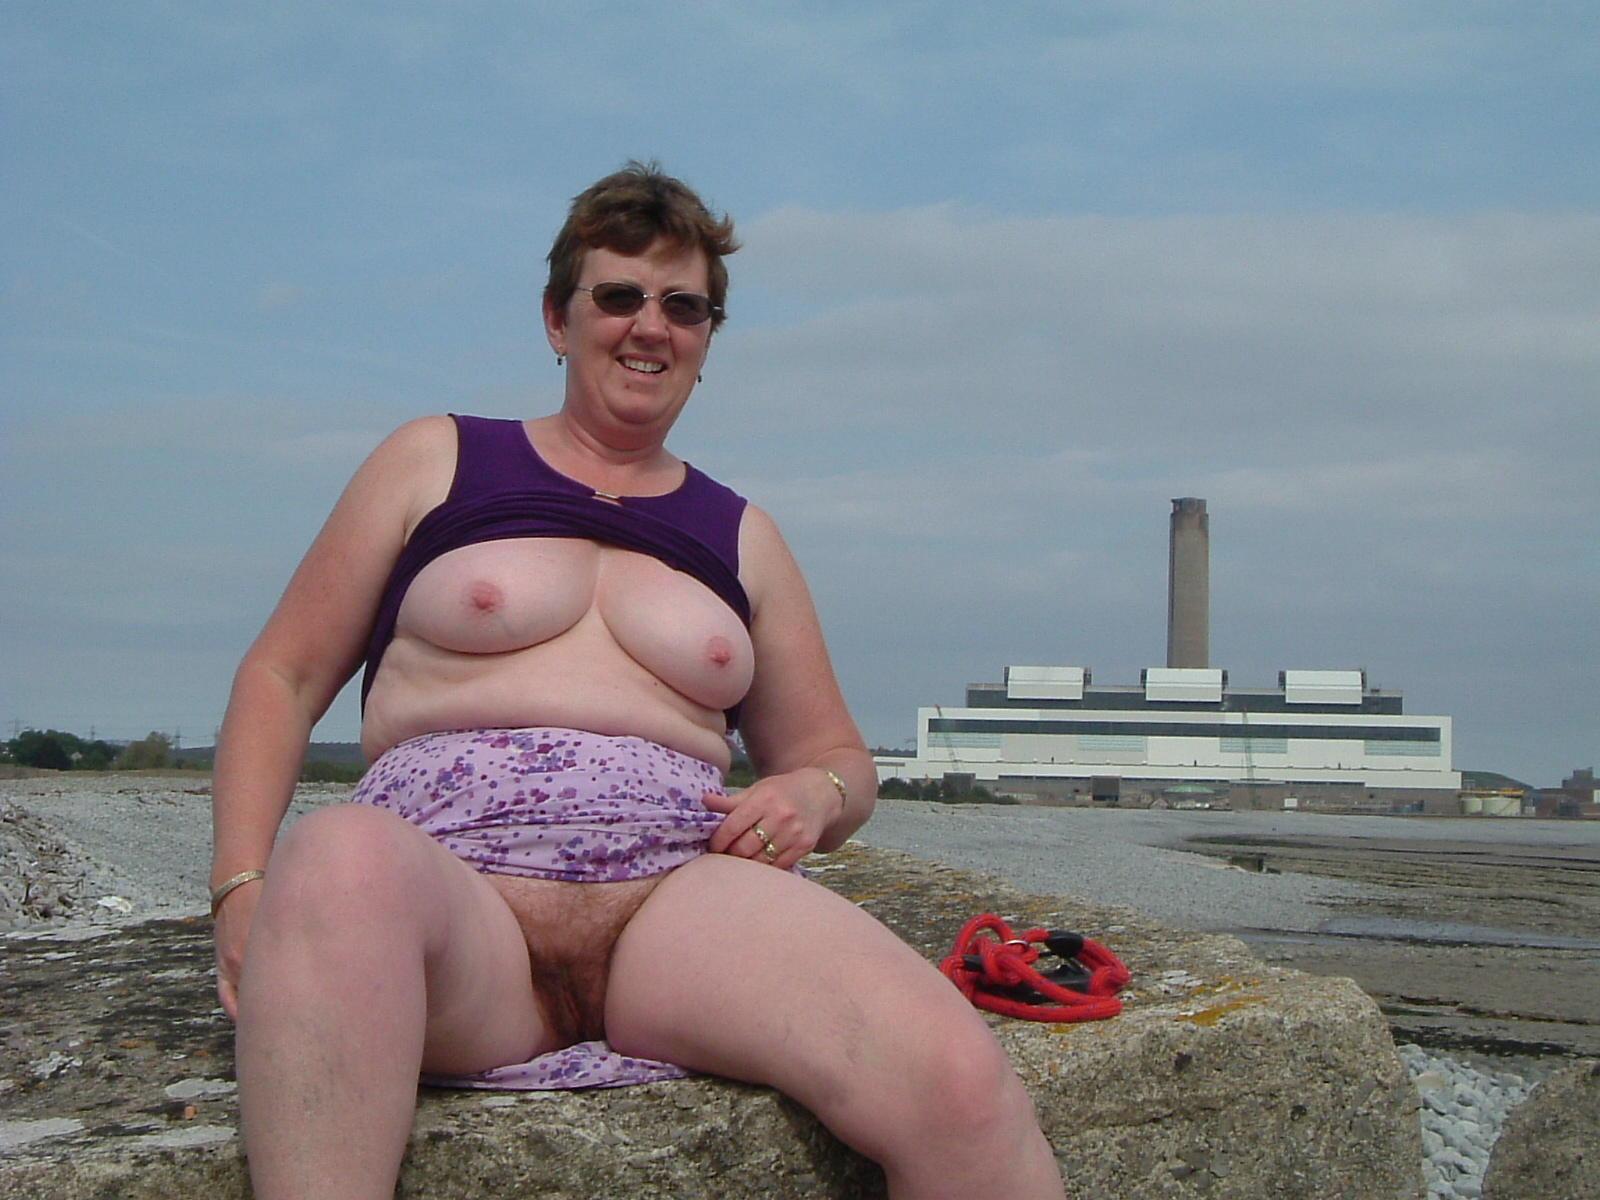 playboy girl naked vagina